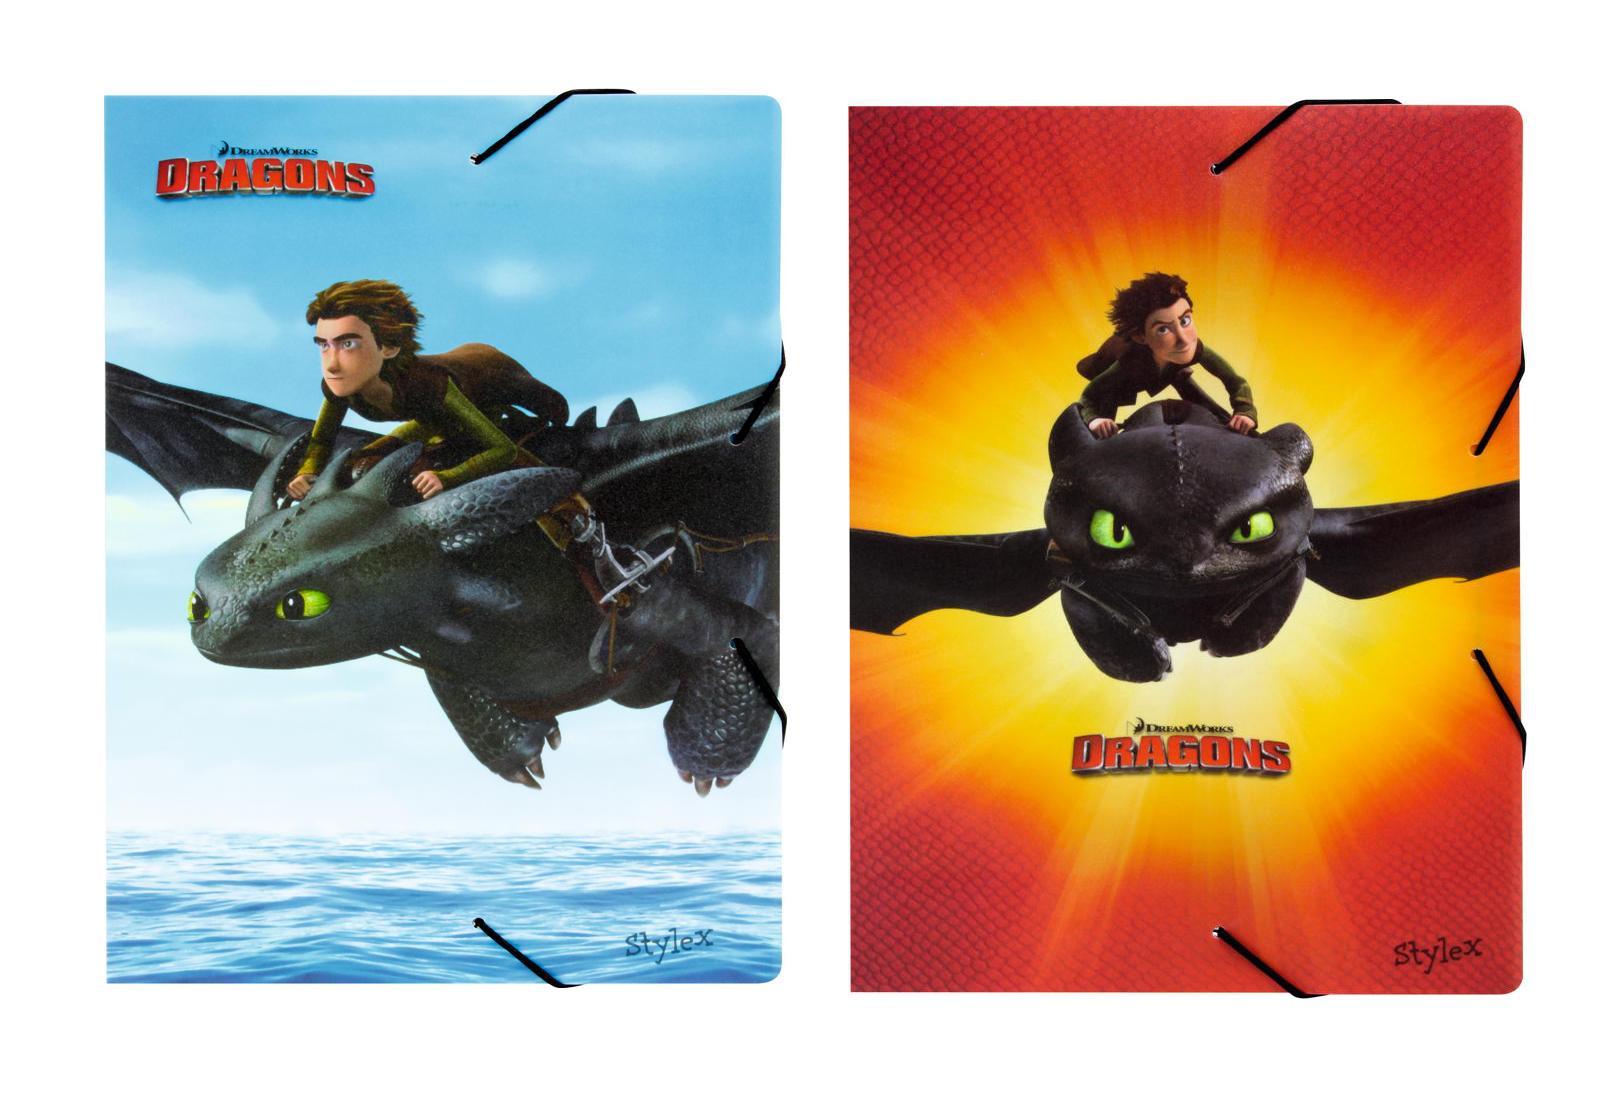 2x Dragons Heftbox Din A4 Aus Pp 2 Verschiedene Motive Ebay